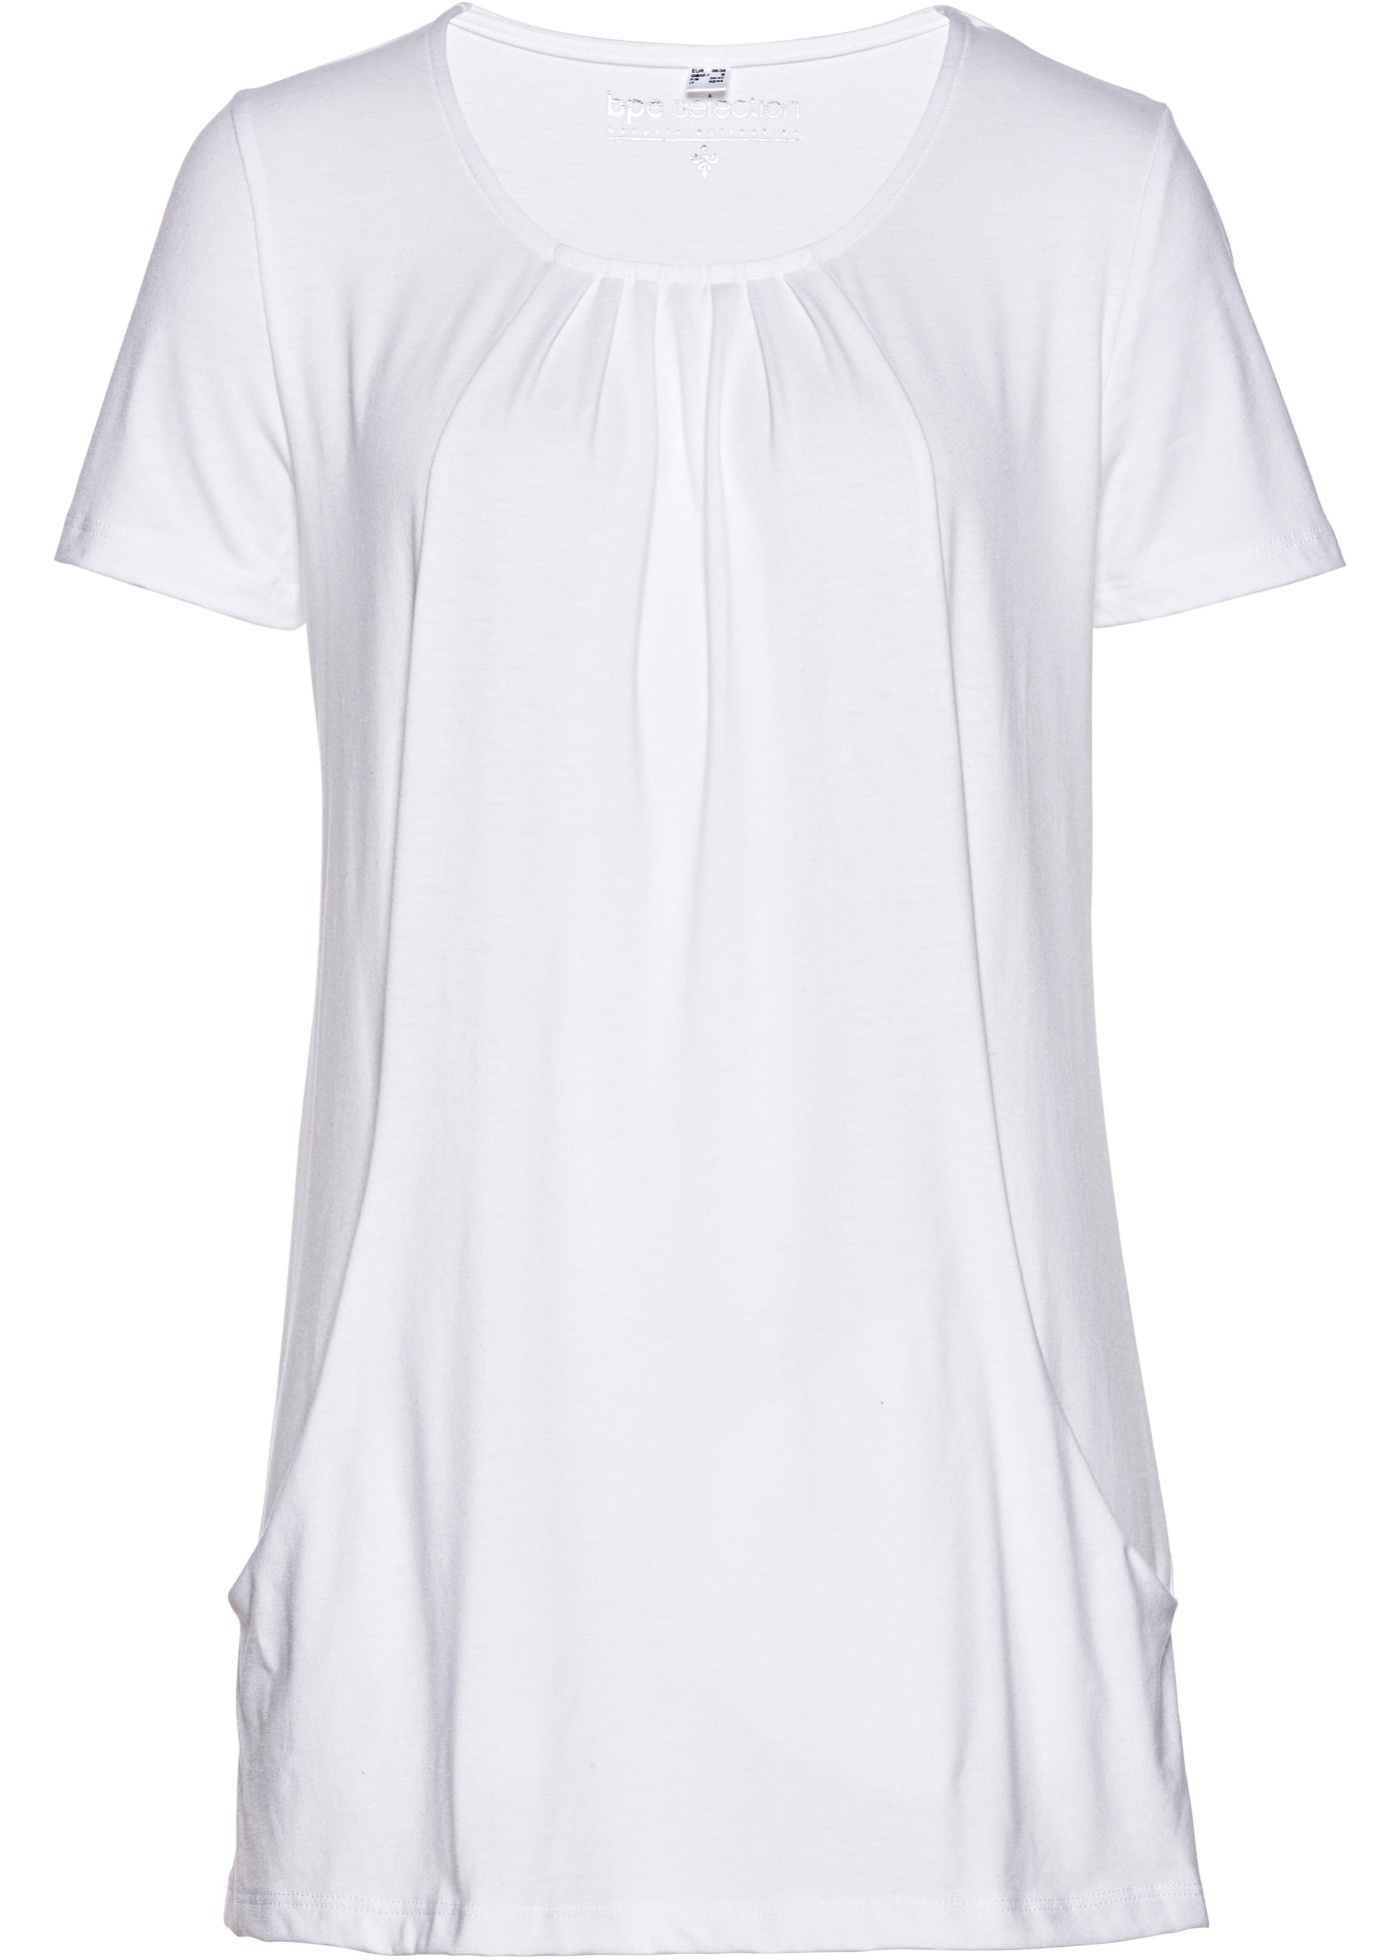 Dlouhé tričko - Bílá